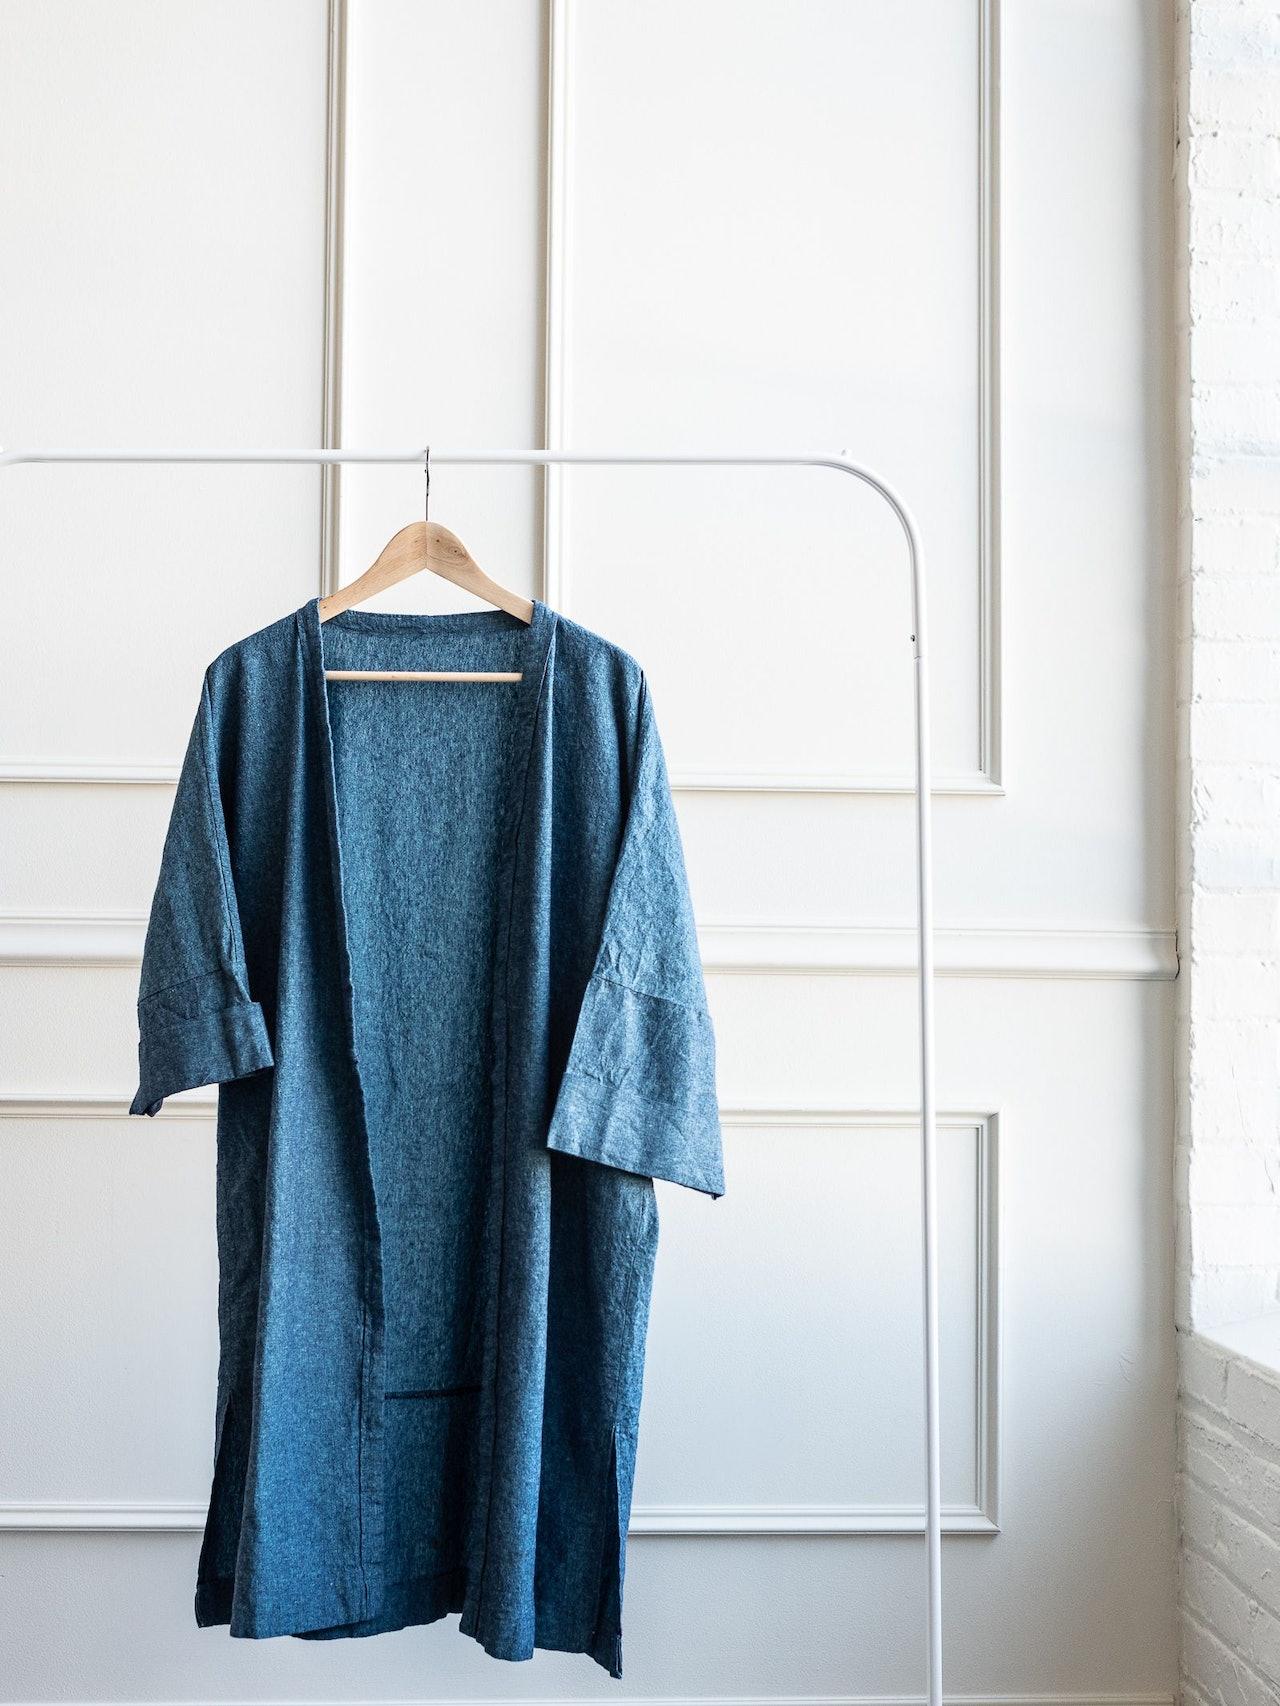 Vintage Blue Kimono Jacket by Conscious by Chloé